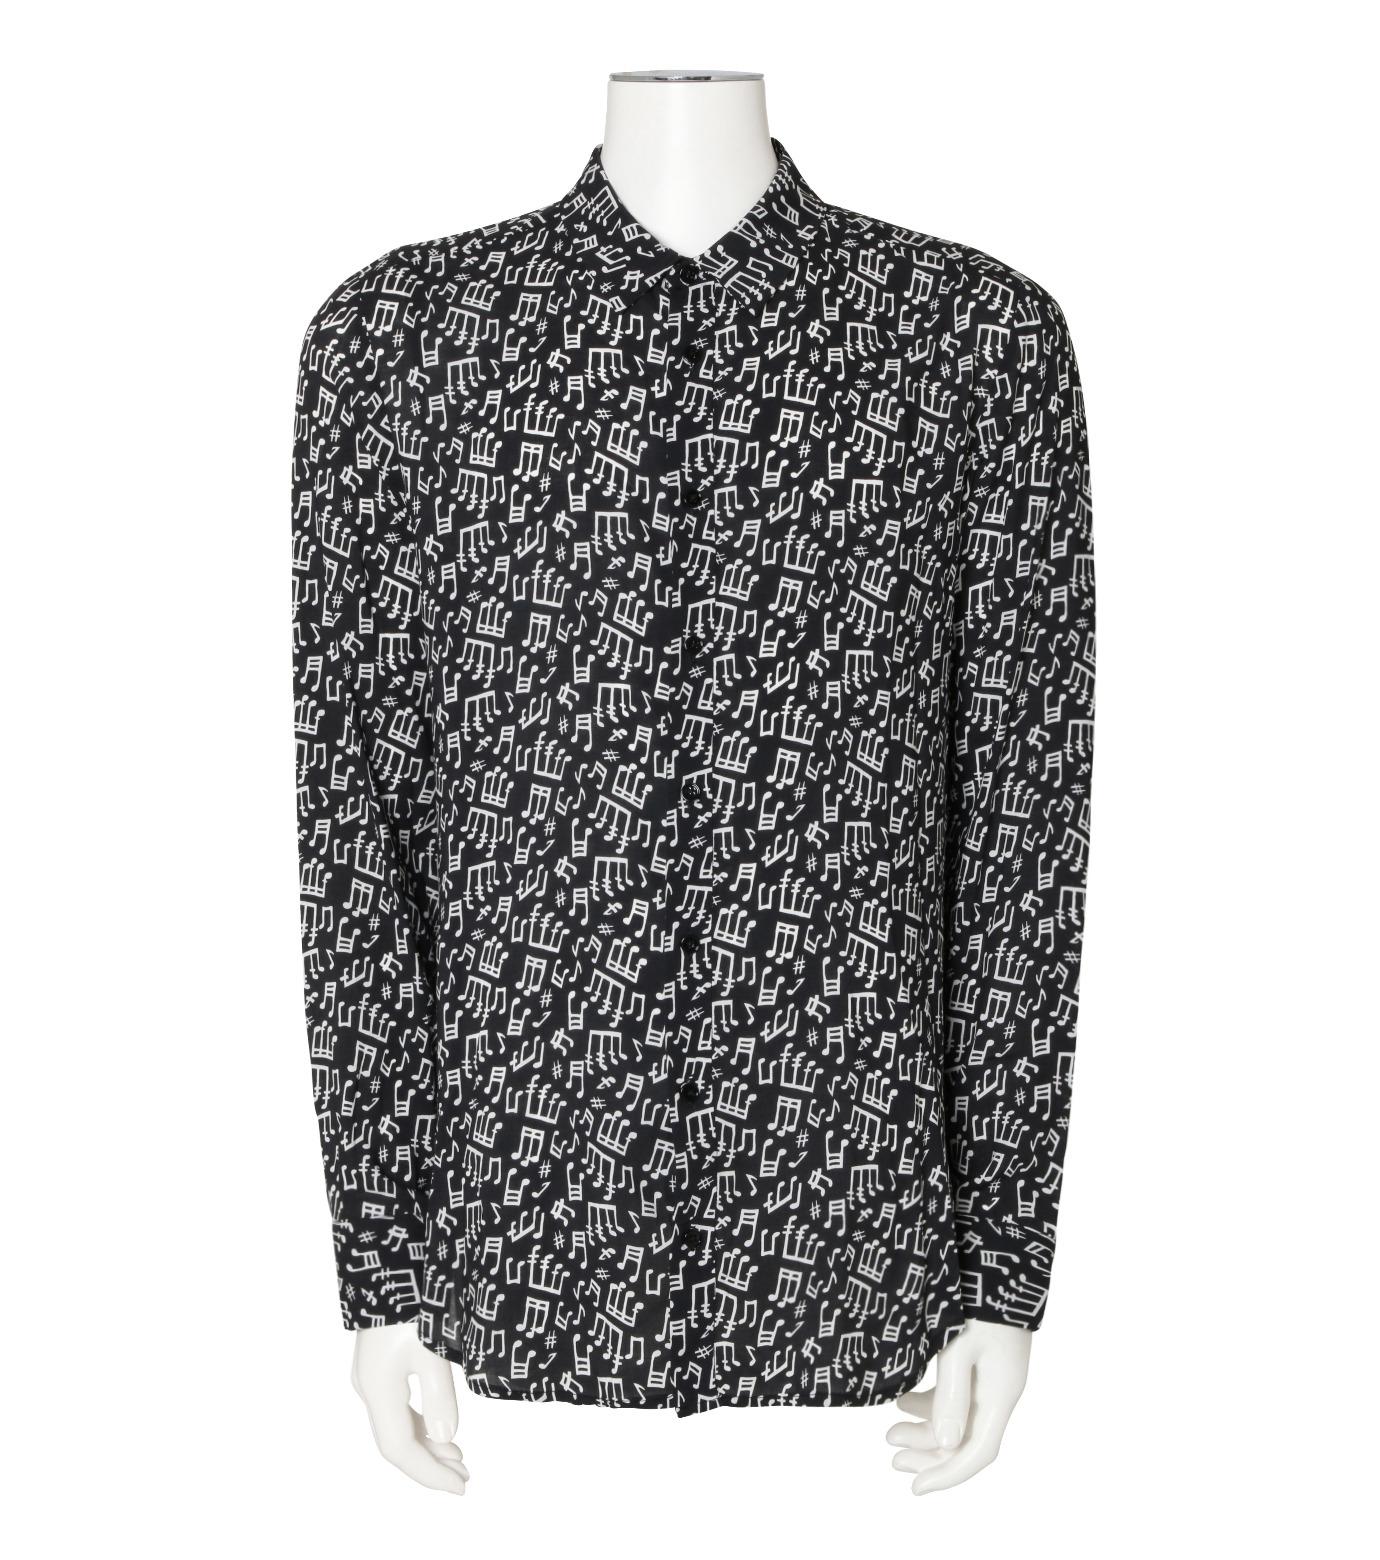 GARCONS INFIDELES(ギャルソン・インフィデレス)のMusic Shirt-BLACK(シャツ/shirt)-TUNES-13 拡大詳細画像1